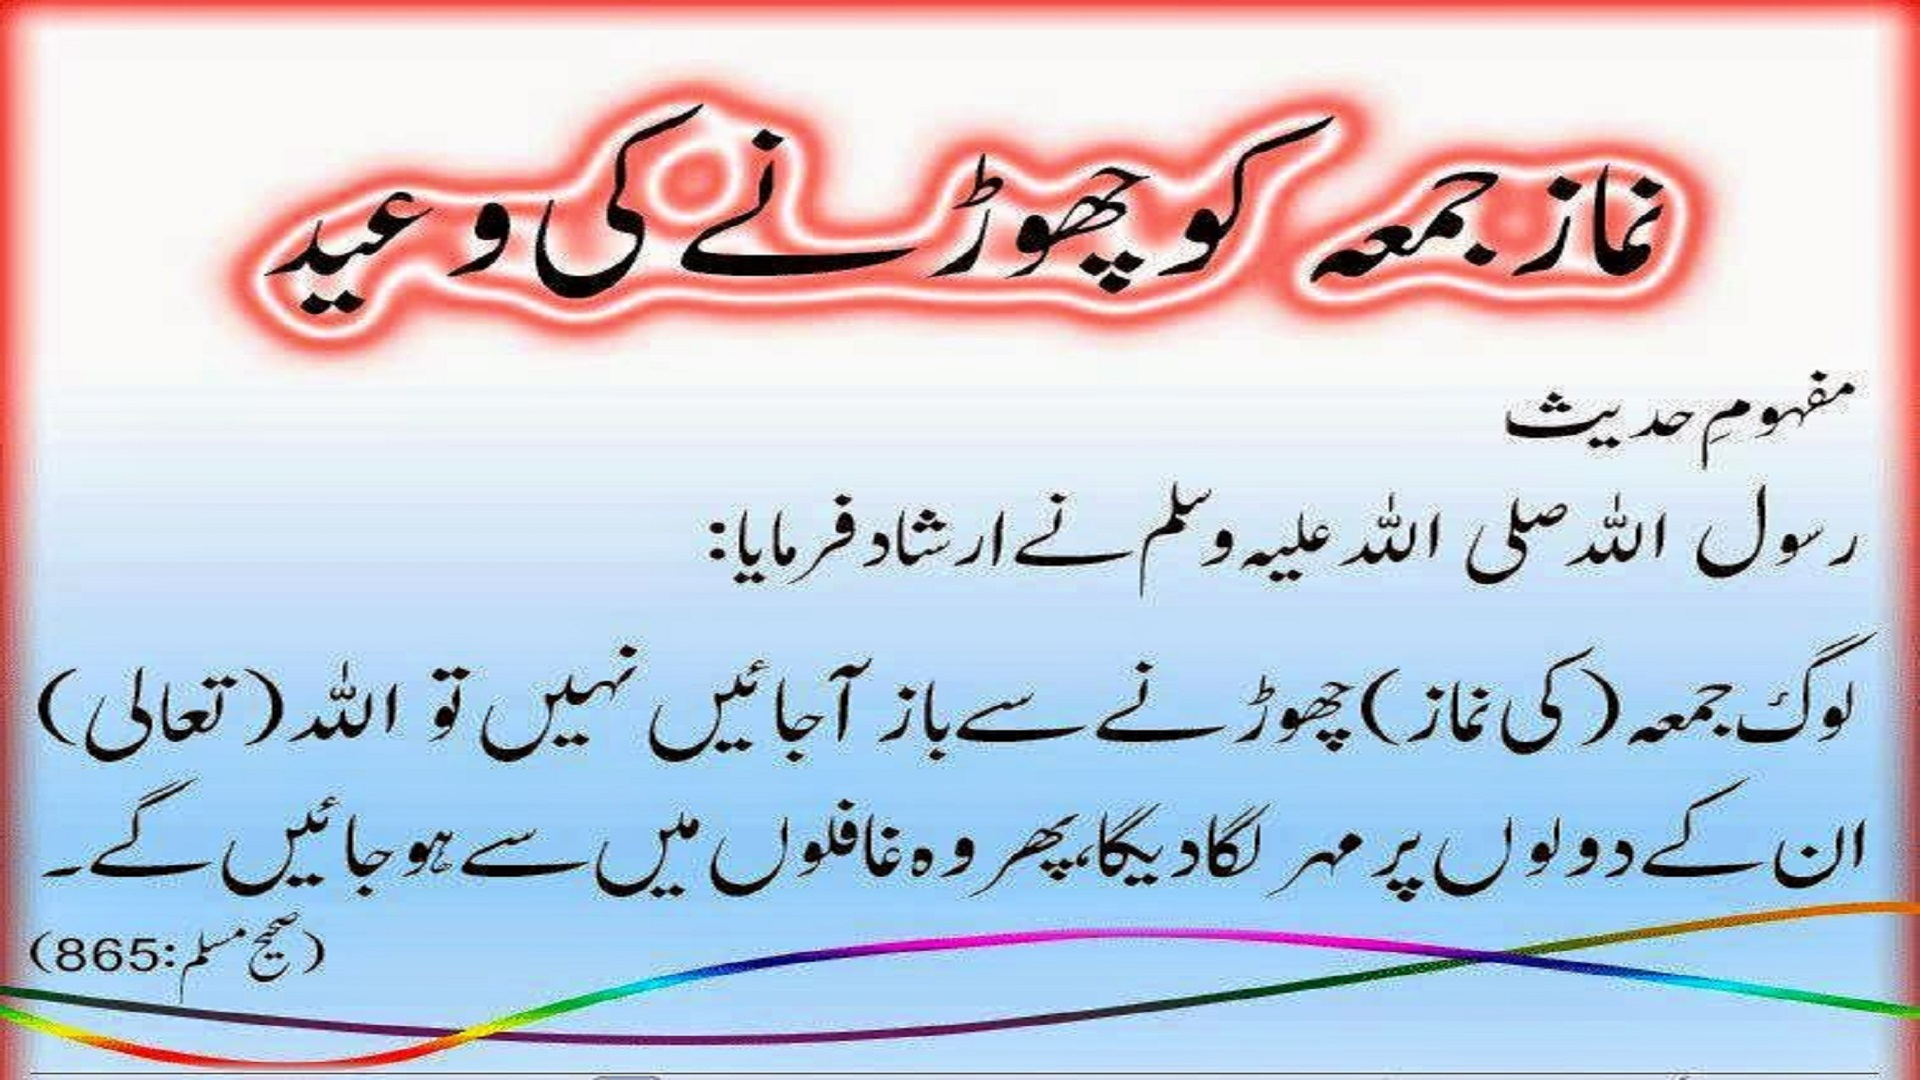 Funny Wallpapers For Desktop Hd Jumma Mubarak Hadith In Urdu Wallpaper Hd Free Wallpapers